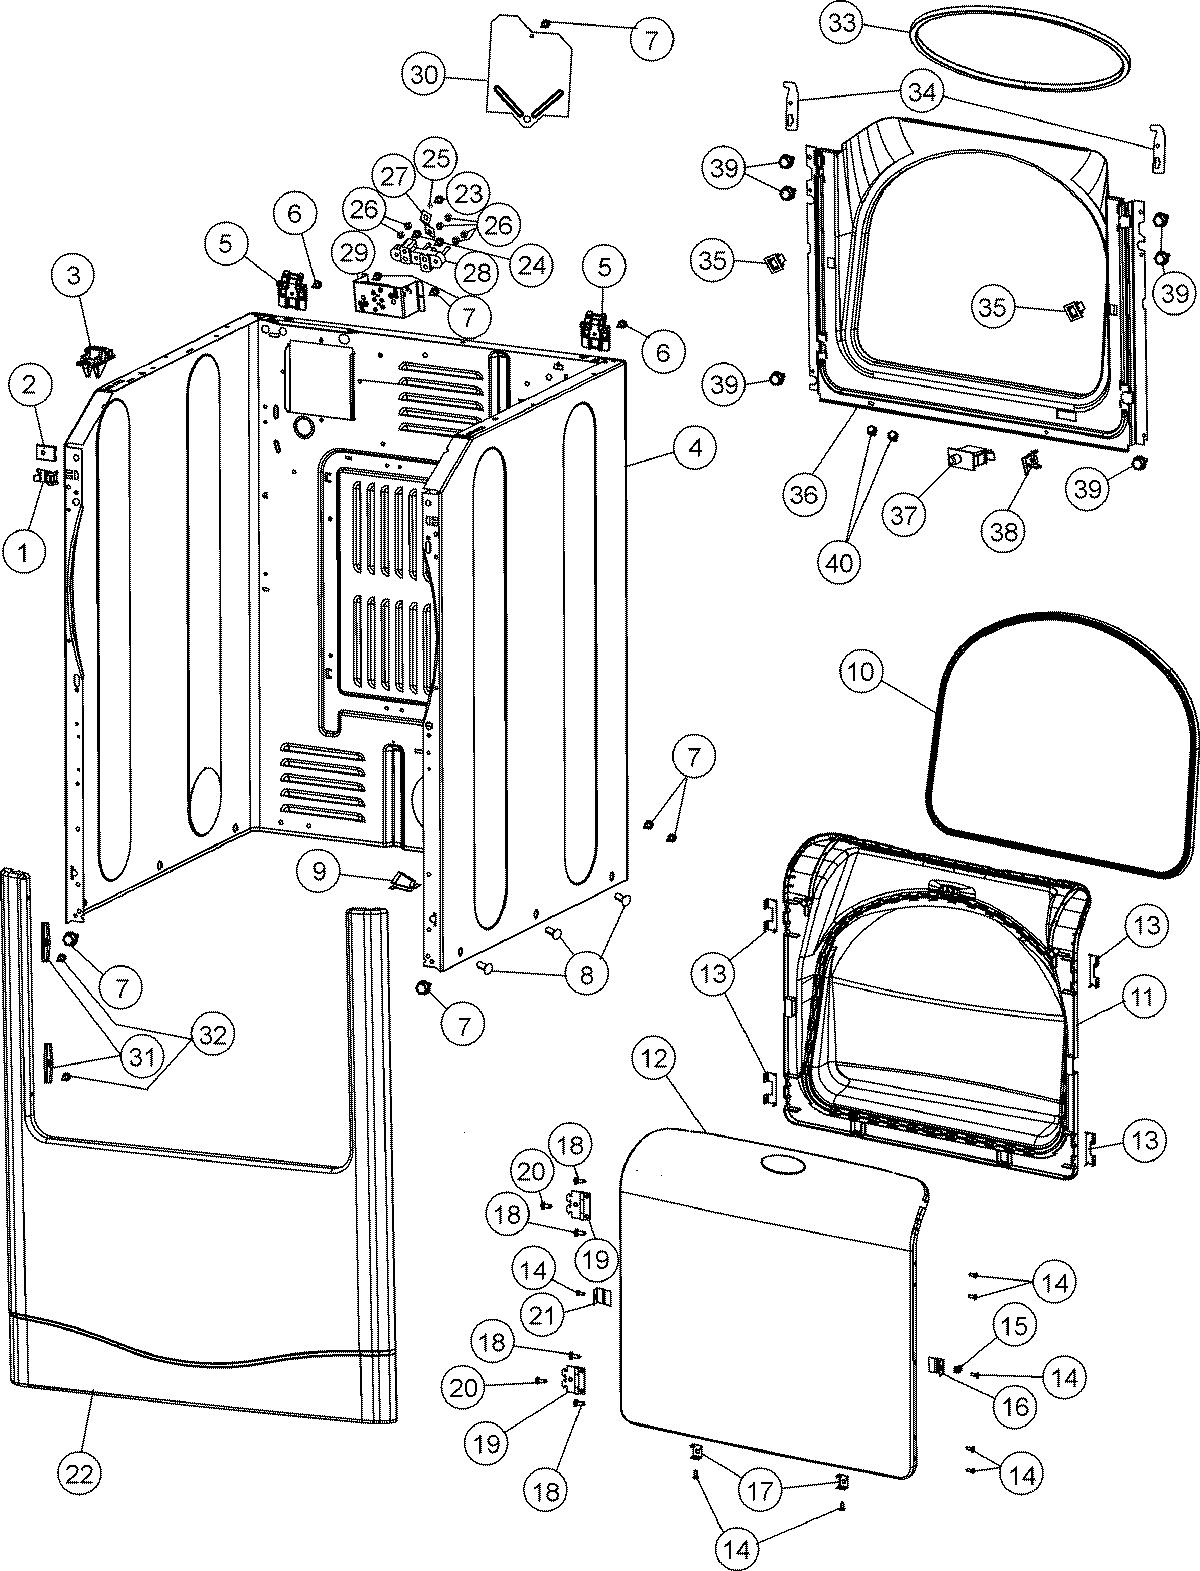 hight resolution of maytag mde6800ayq cabinet diagram